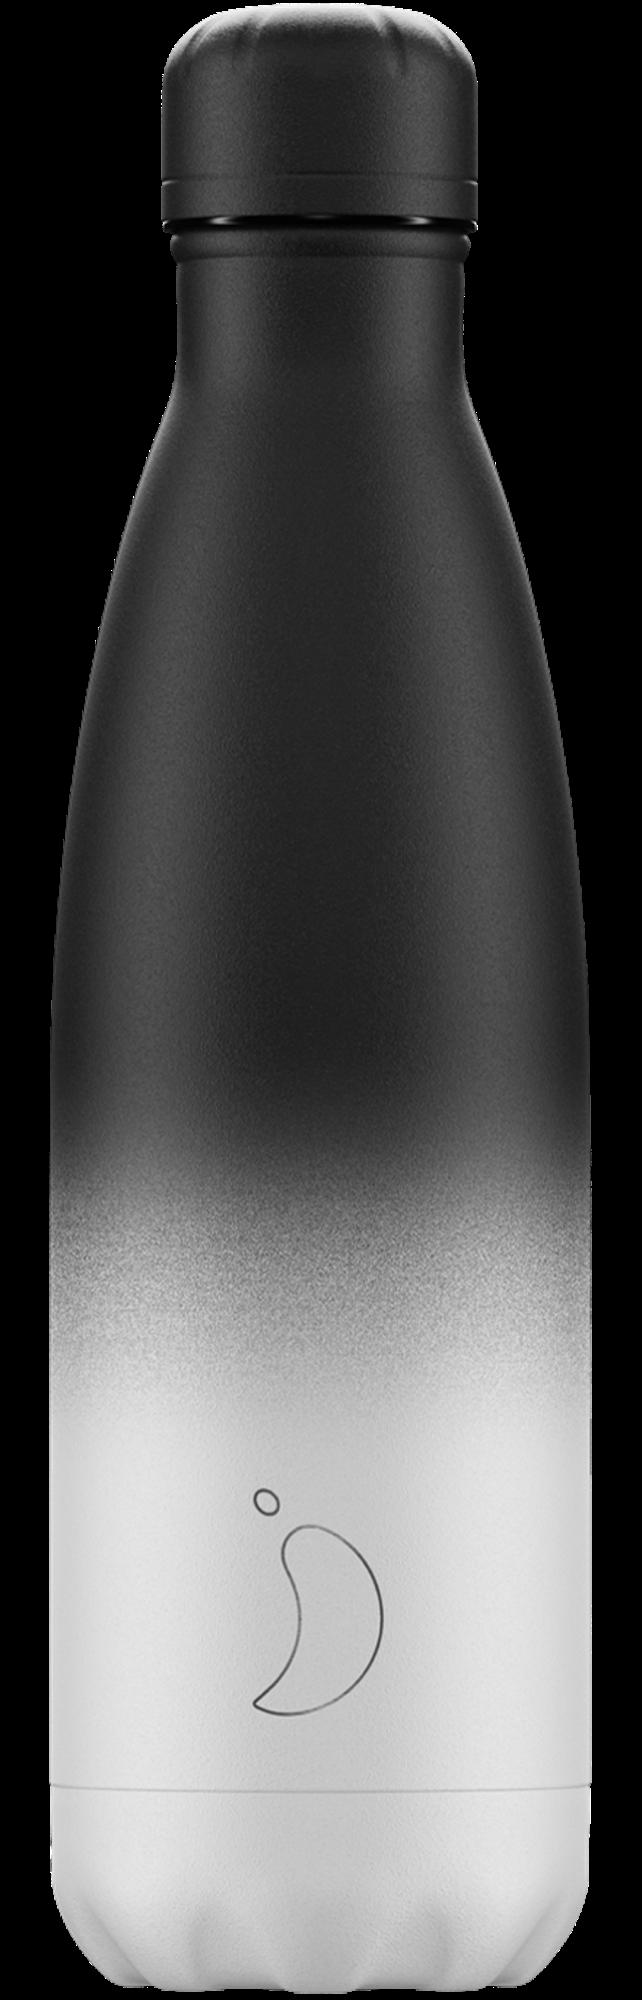 CHILLY'S BOTTLE 500ML - [GRADIENT) MONOCHROME